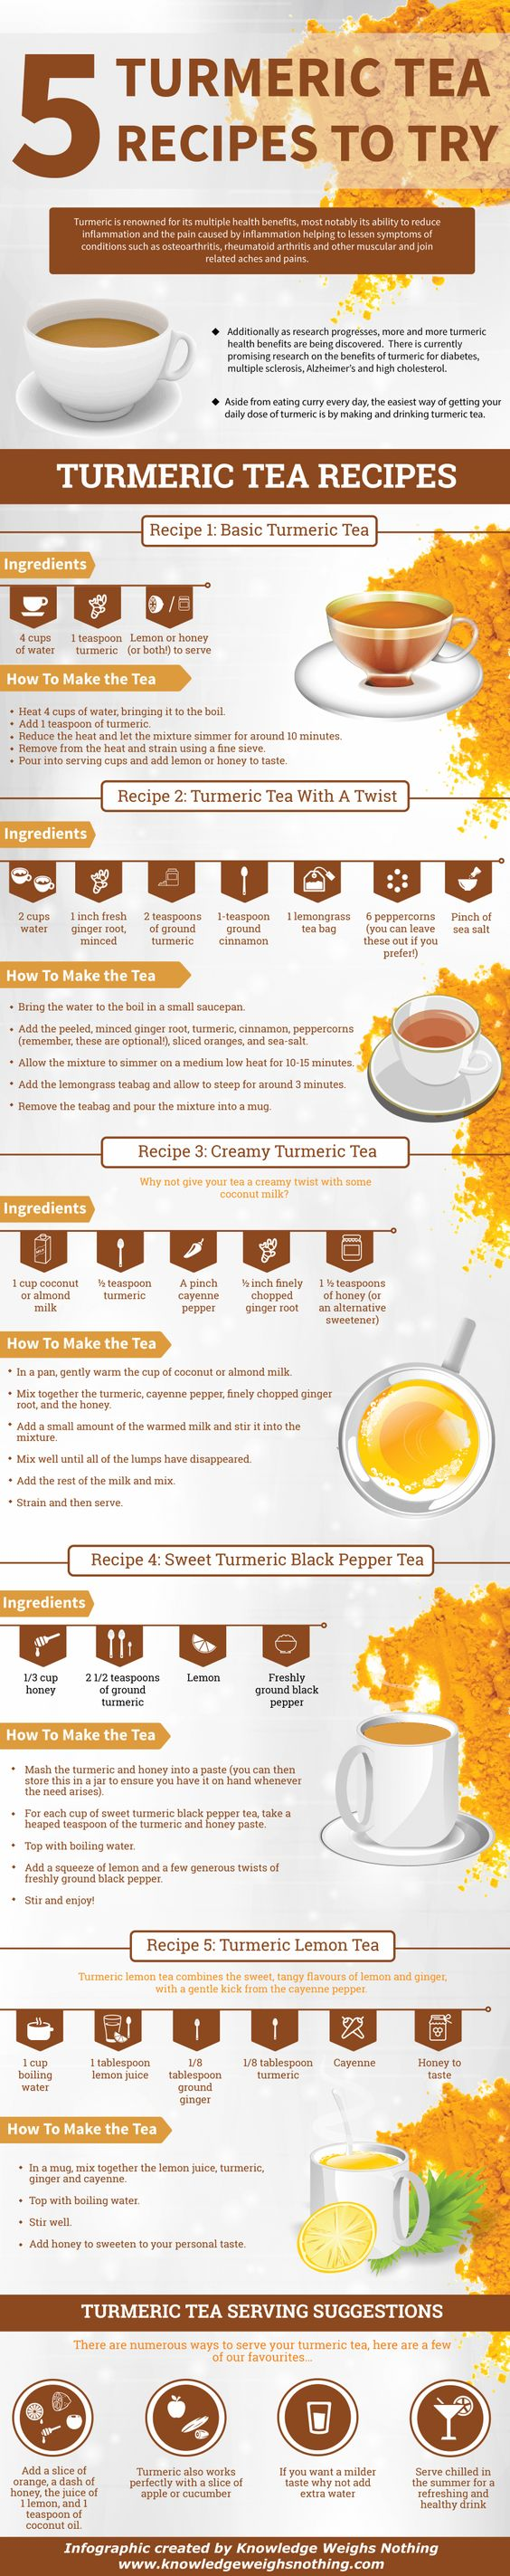 [NEED A HEALTHY BODY SLIMMING CLEANSE? - Get 28 day Full body slimming Detox Tea Program - WWW.DETOXMETEA.COM ]  Turmeric Tea Infographic Web